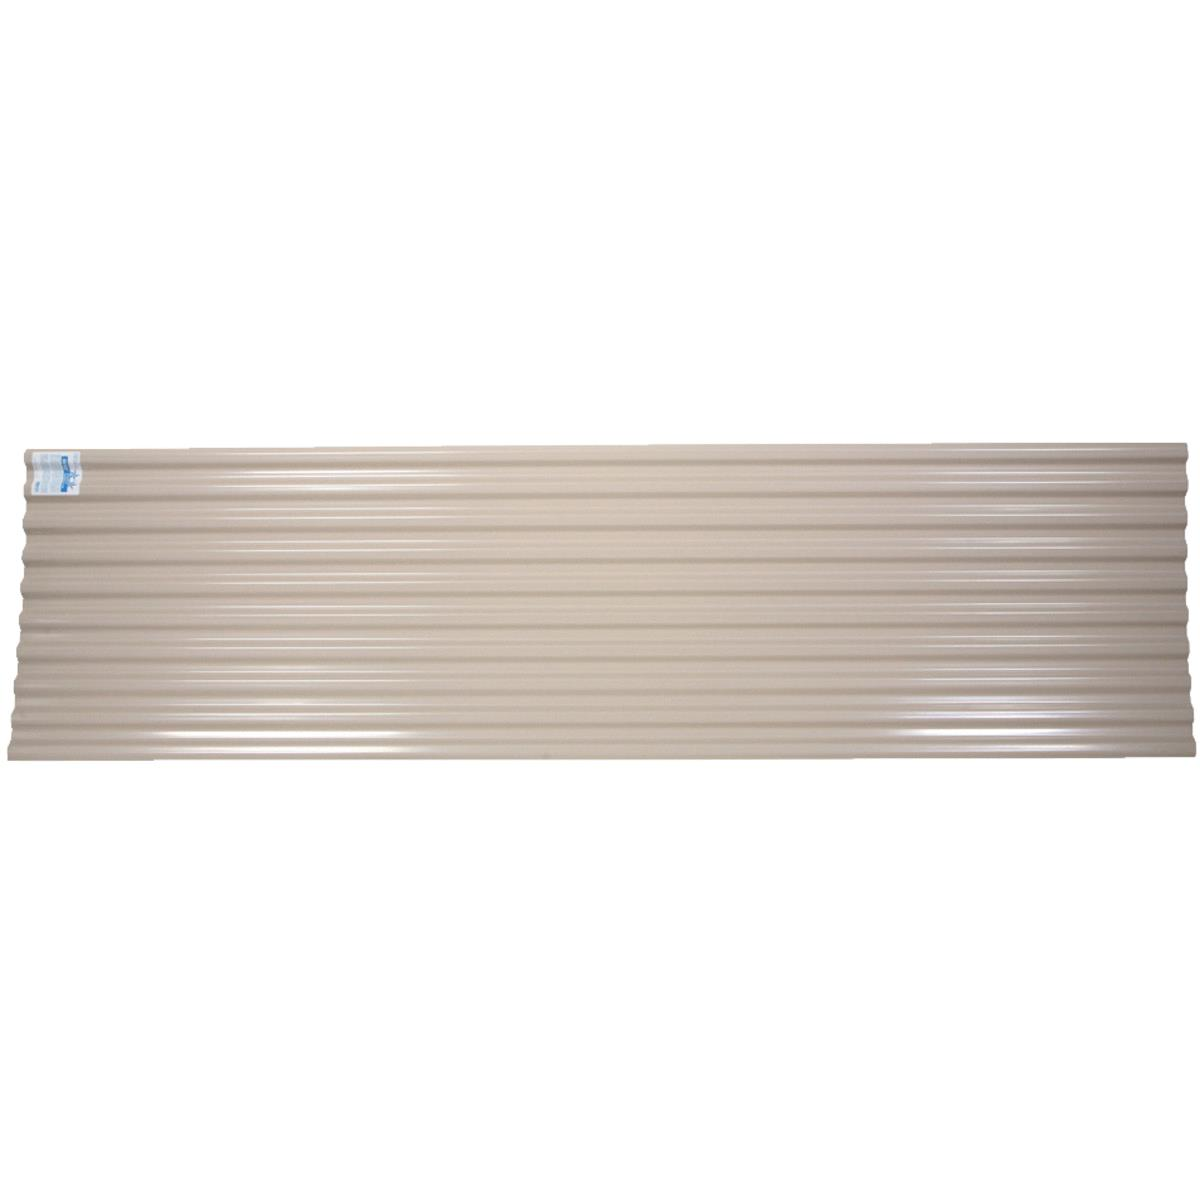 Tuftex UltraVinyl Corrugated Square Wave Panel